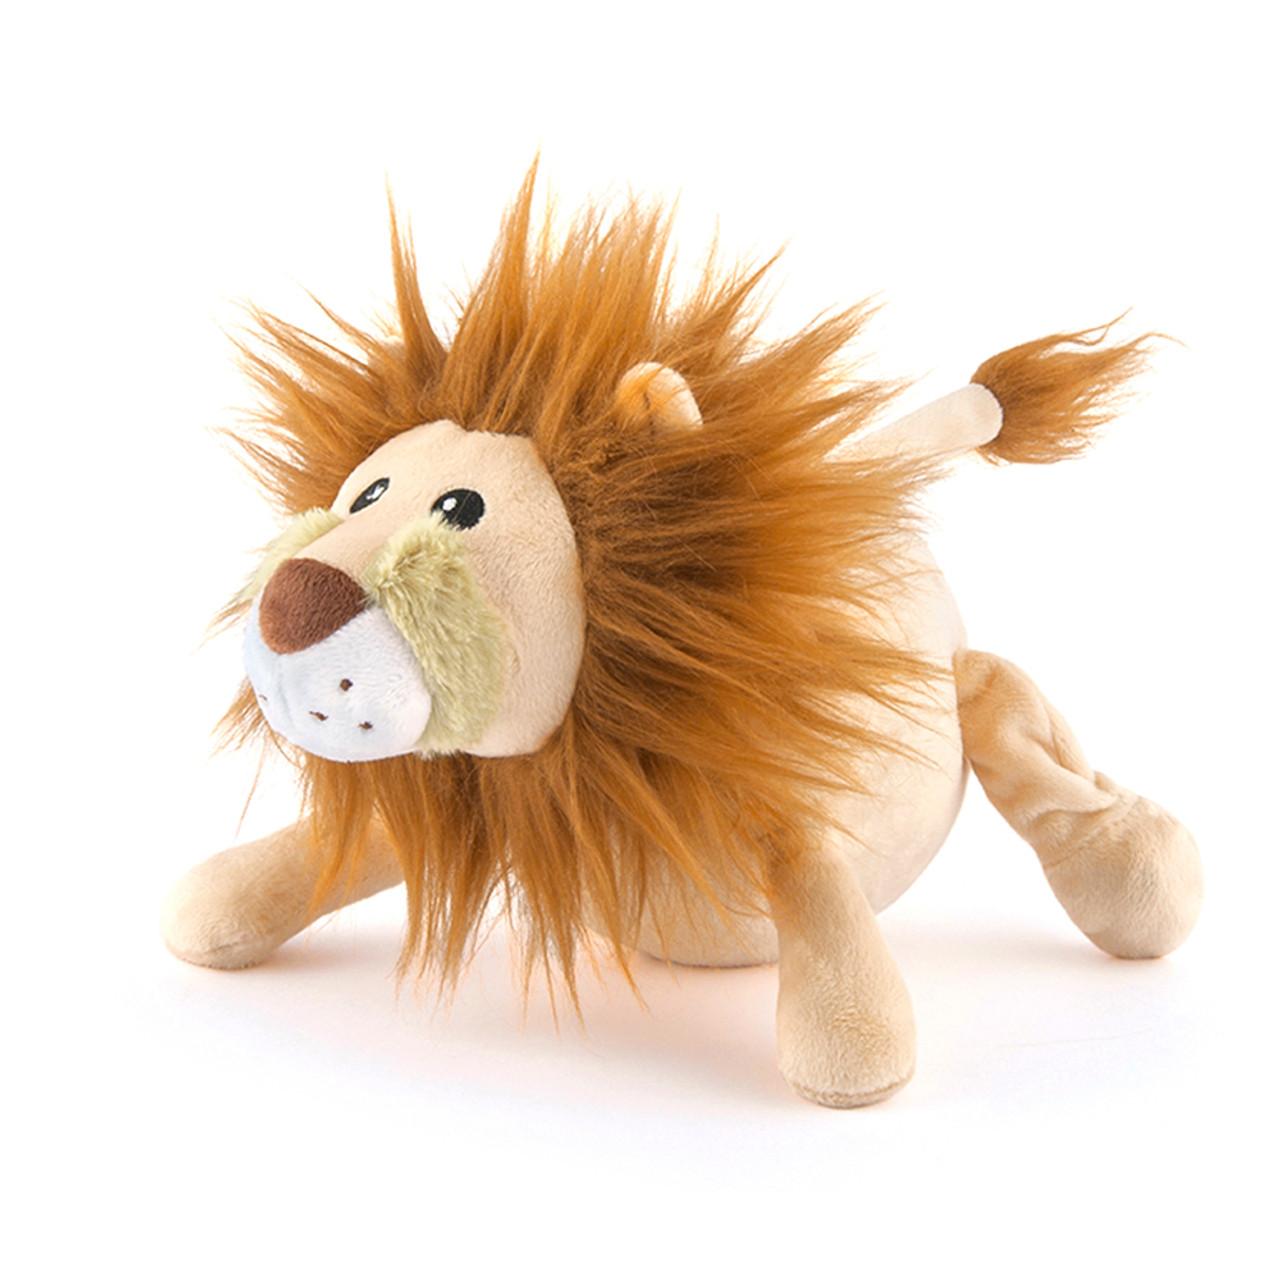 P.L.A.Y. Safari Leonard The Lion Plush Squeaky Dog Toy